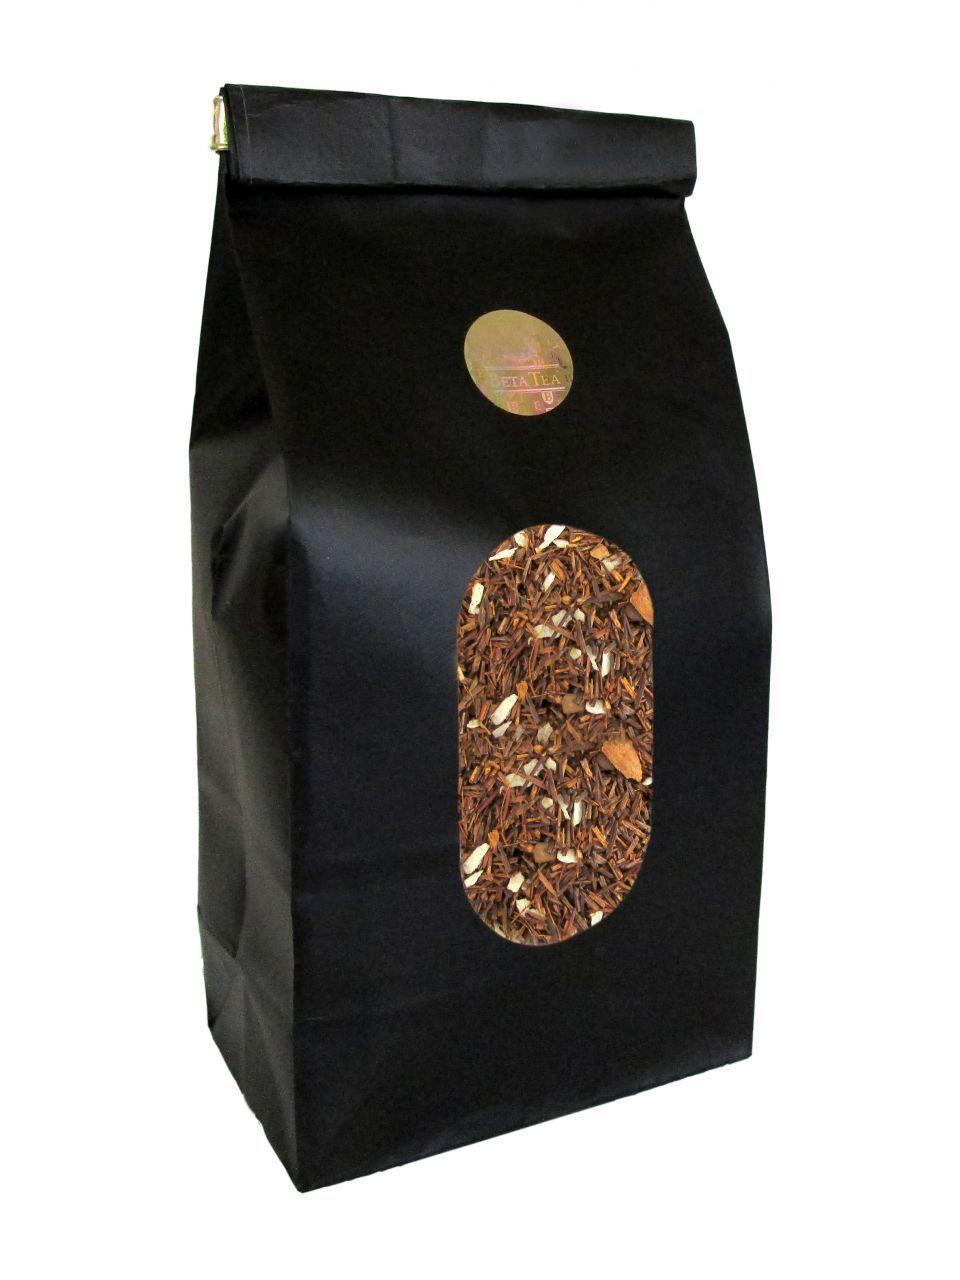 Beta Tea Chocolate Rooibos Tea 50gr Gree Cay Healt Beauty Slimming